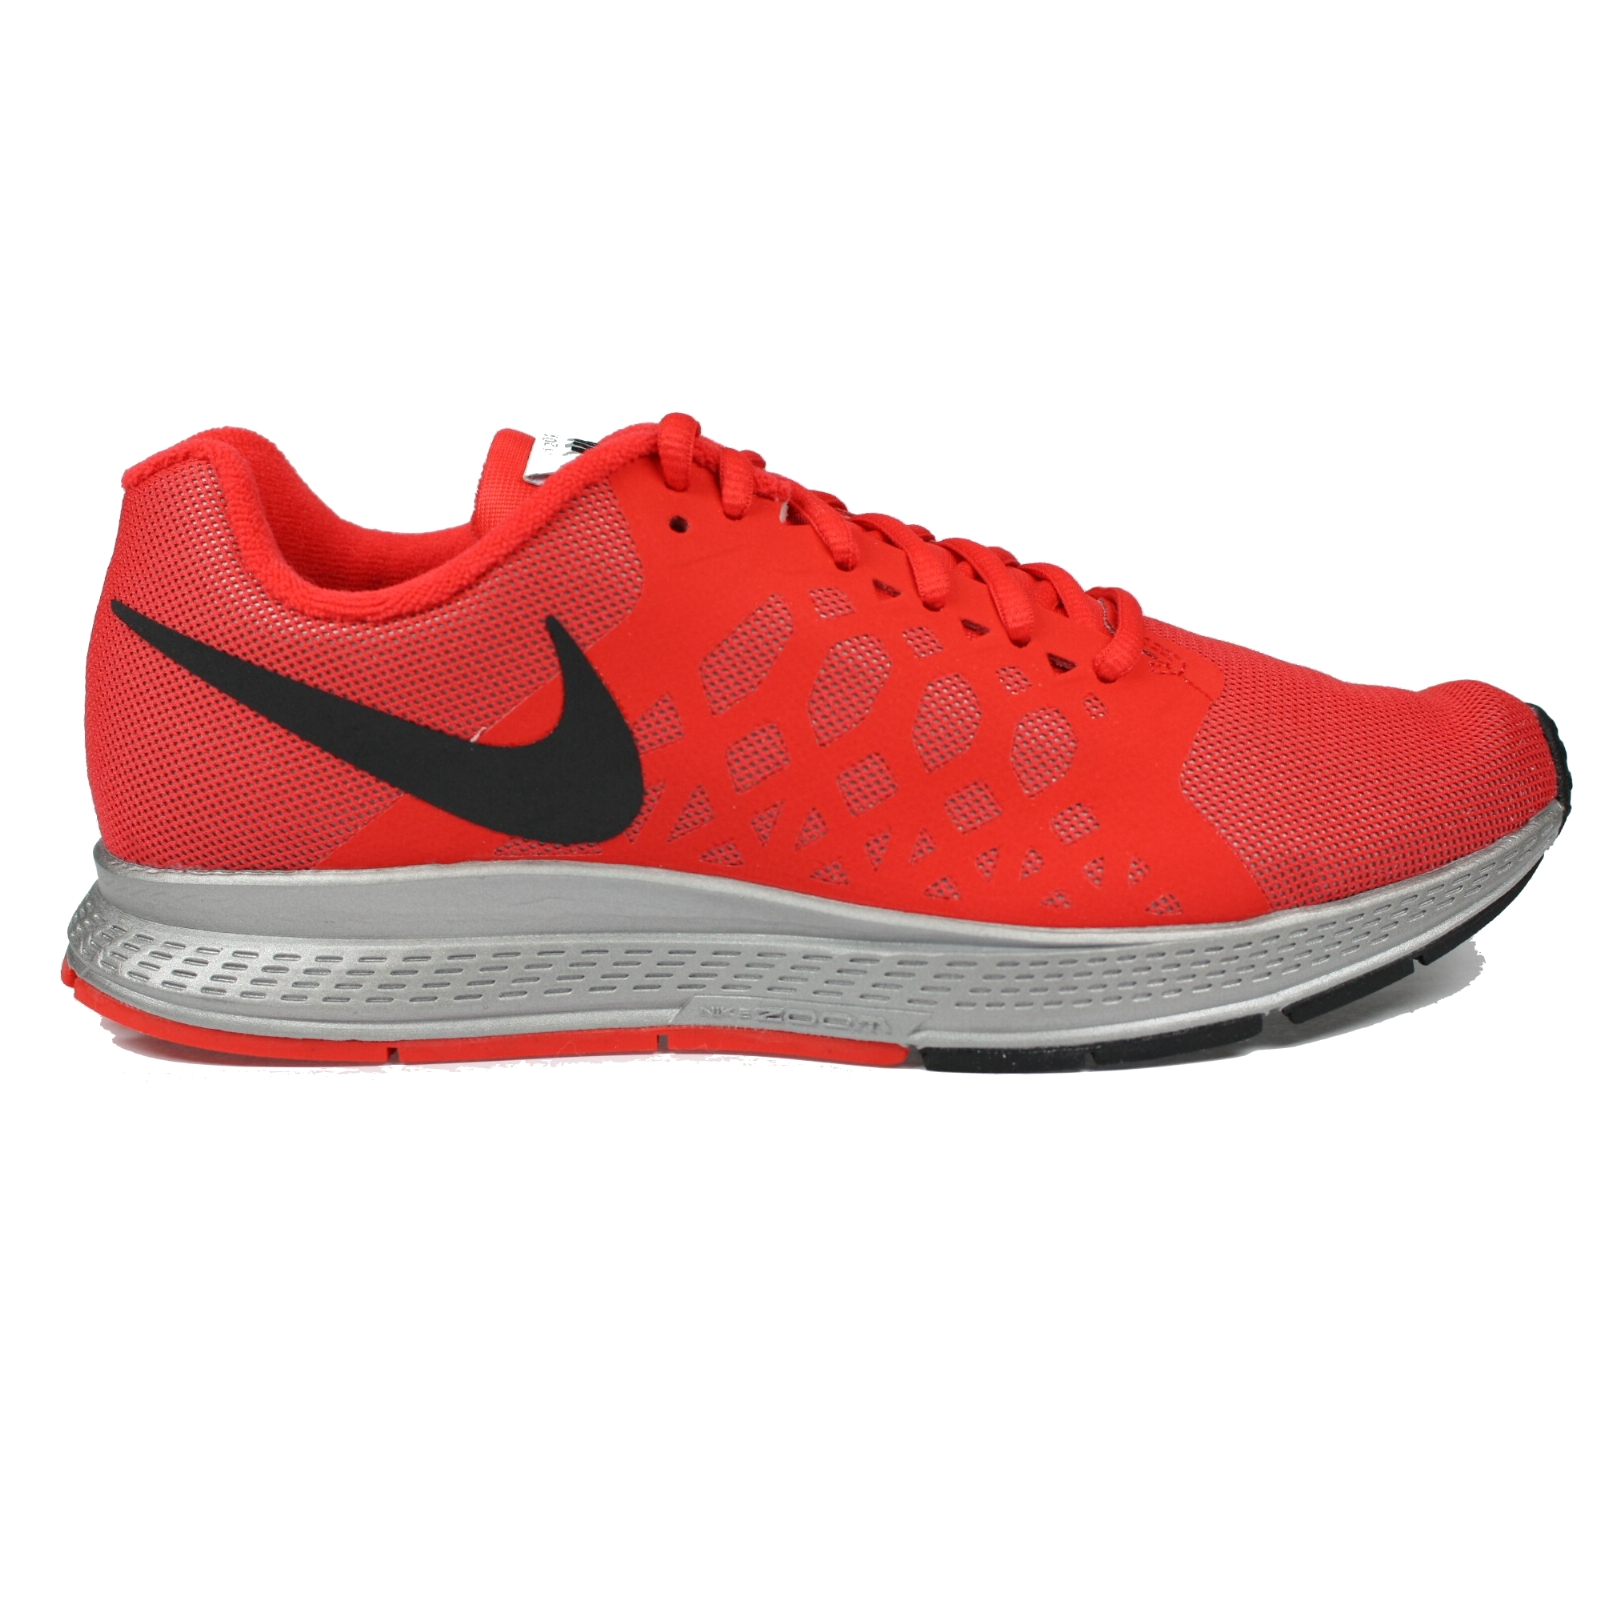 competitive price 91919 e75dc Nike Air Zoom Pegasus 31 Nike Air Zoom Pegasus 31 Review ...